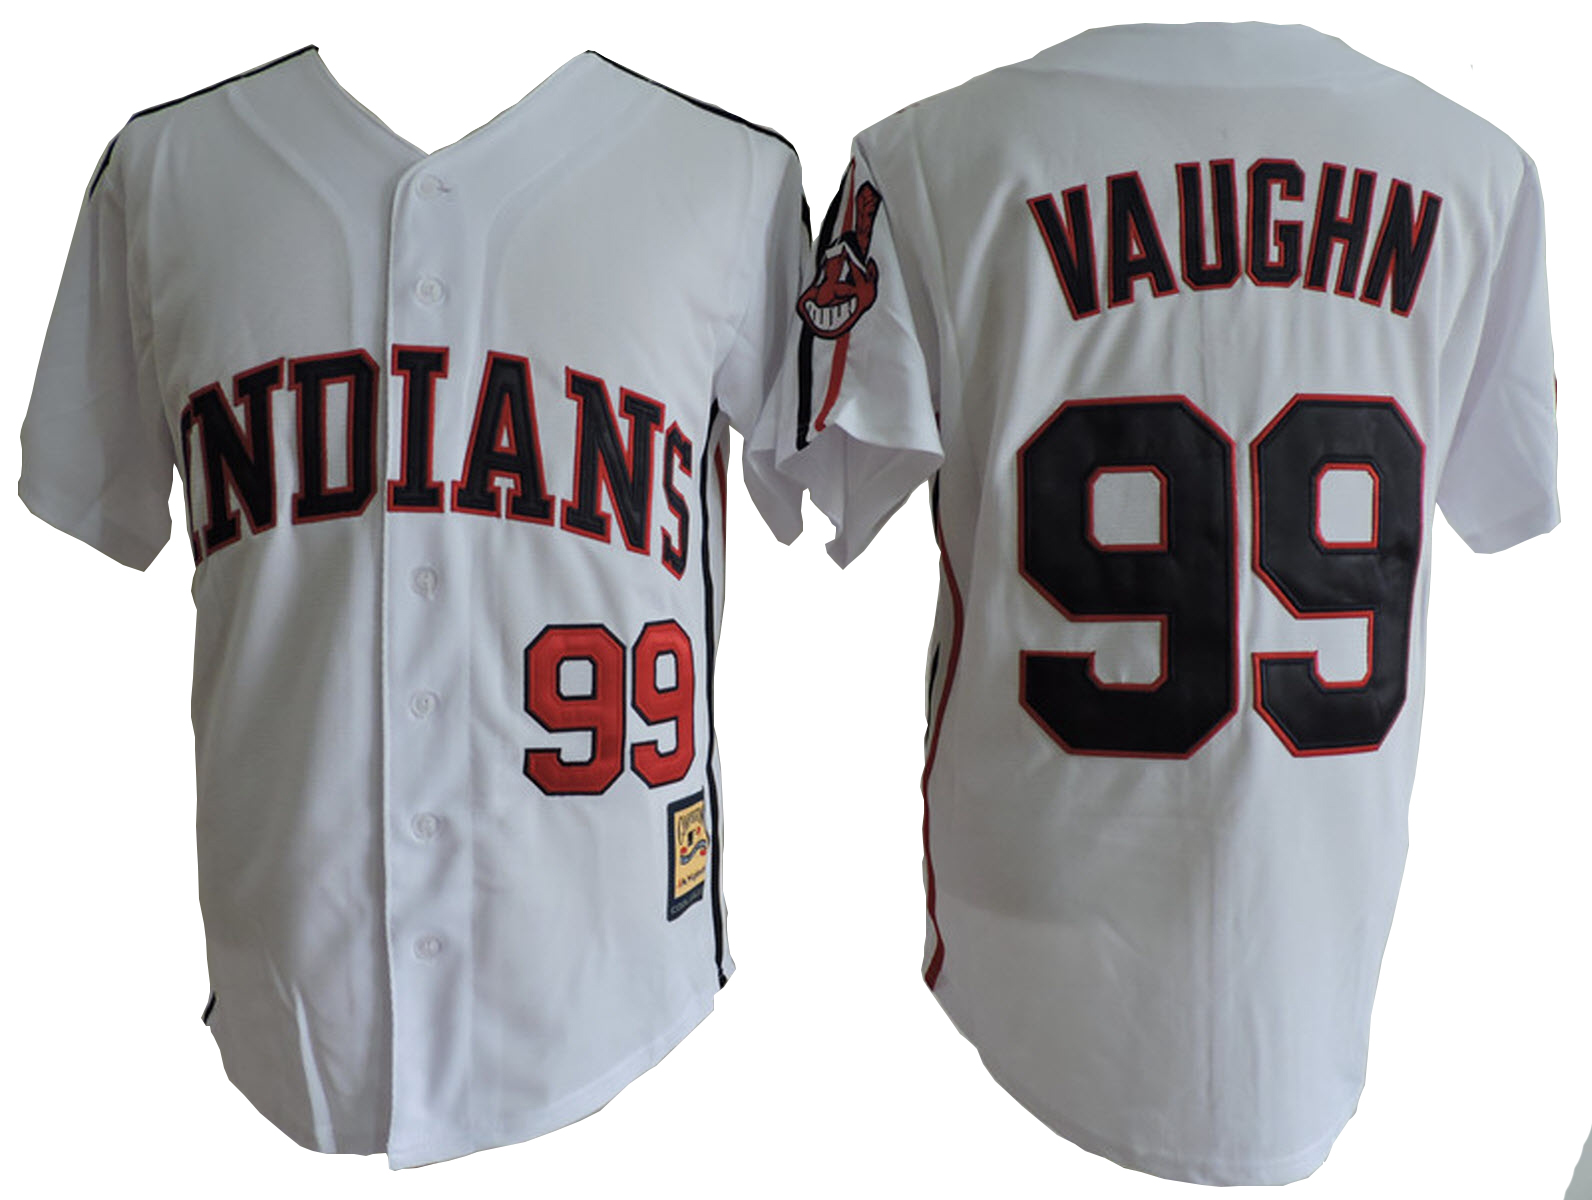 rick thing vaughn 99 jersey major league costume